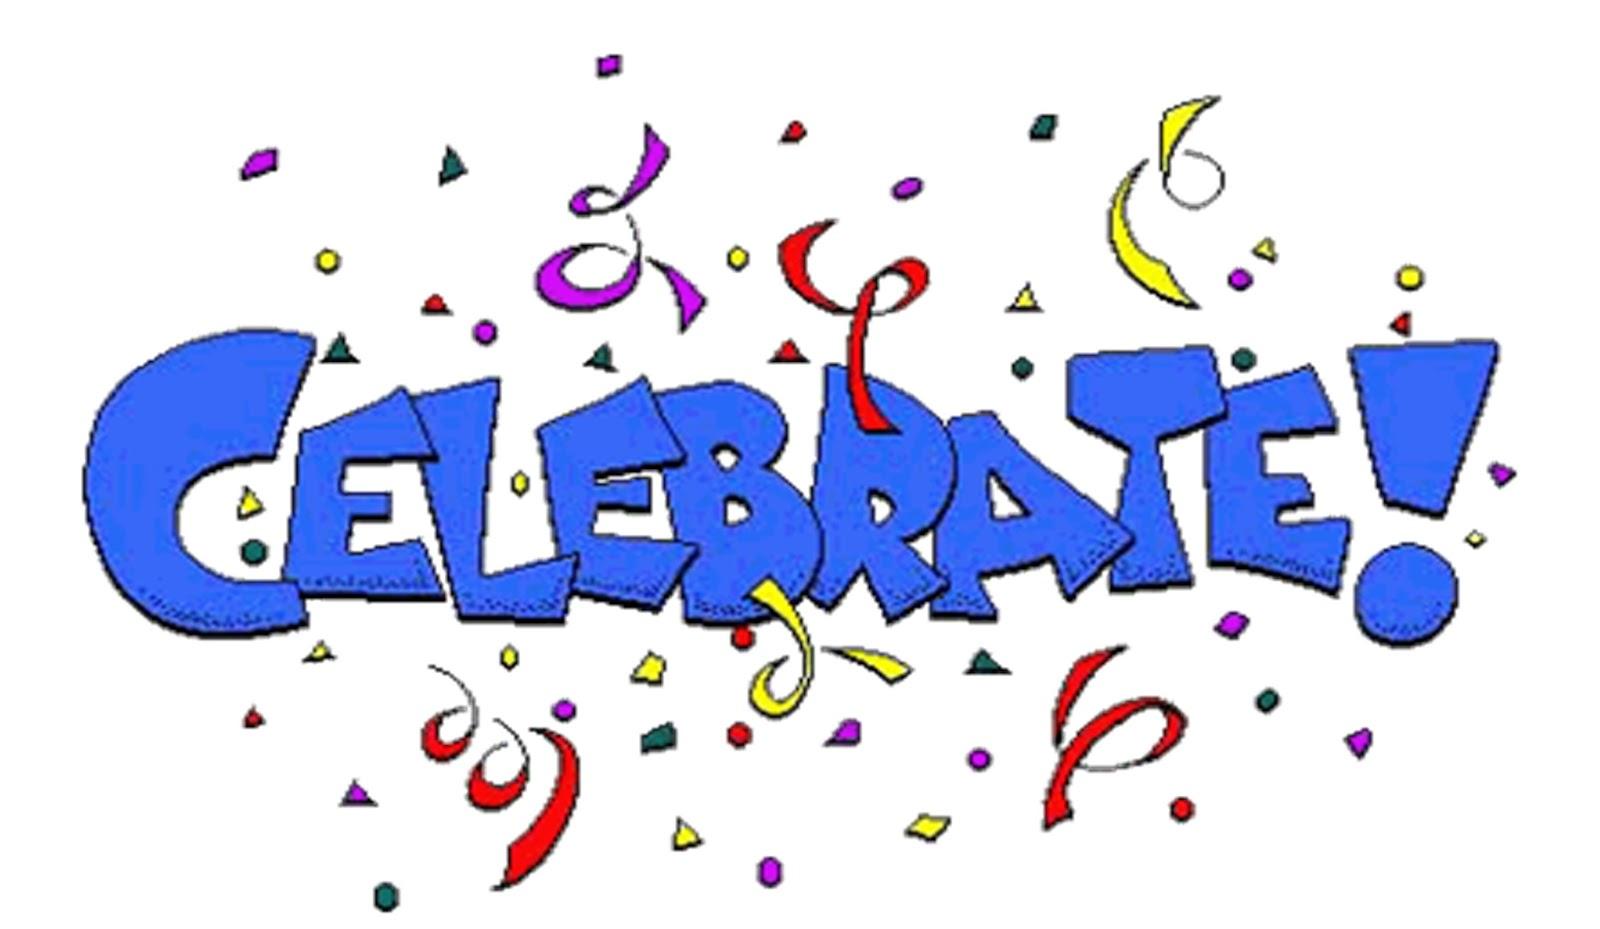 Celebration party clipart to download clipartcow. Celebration houston sports beat let cliparts